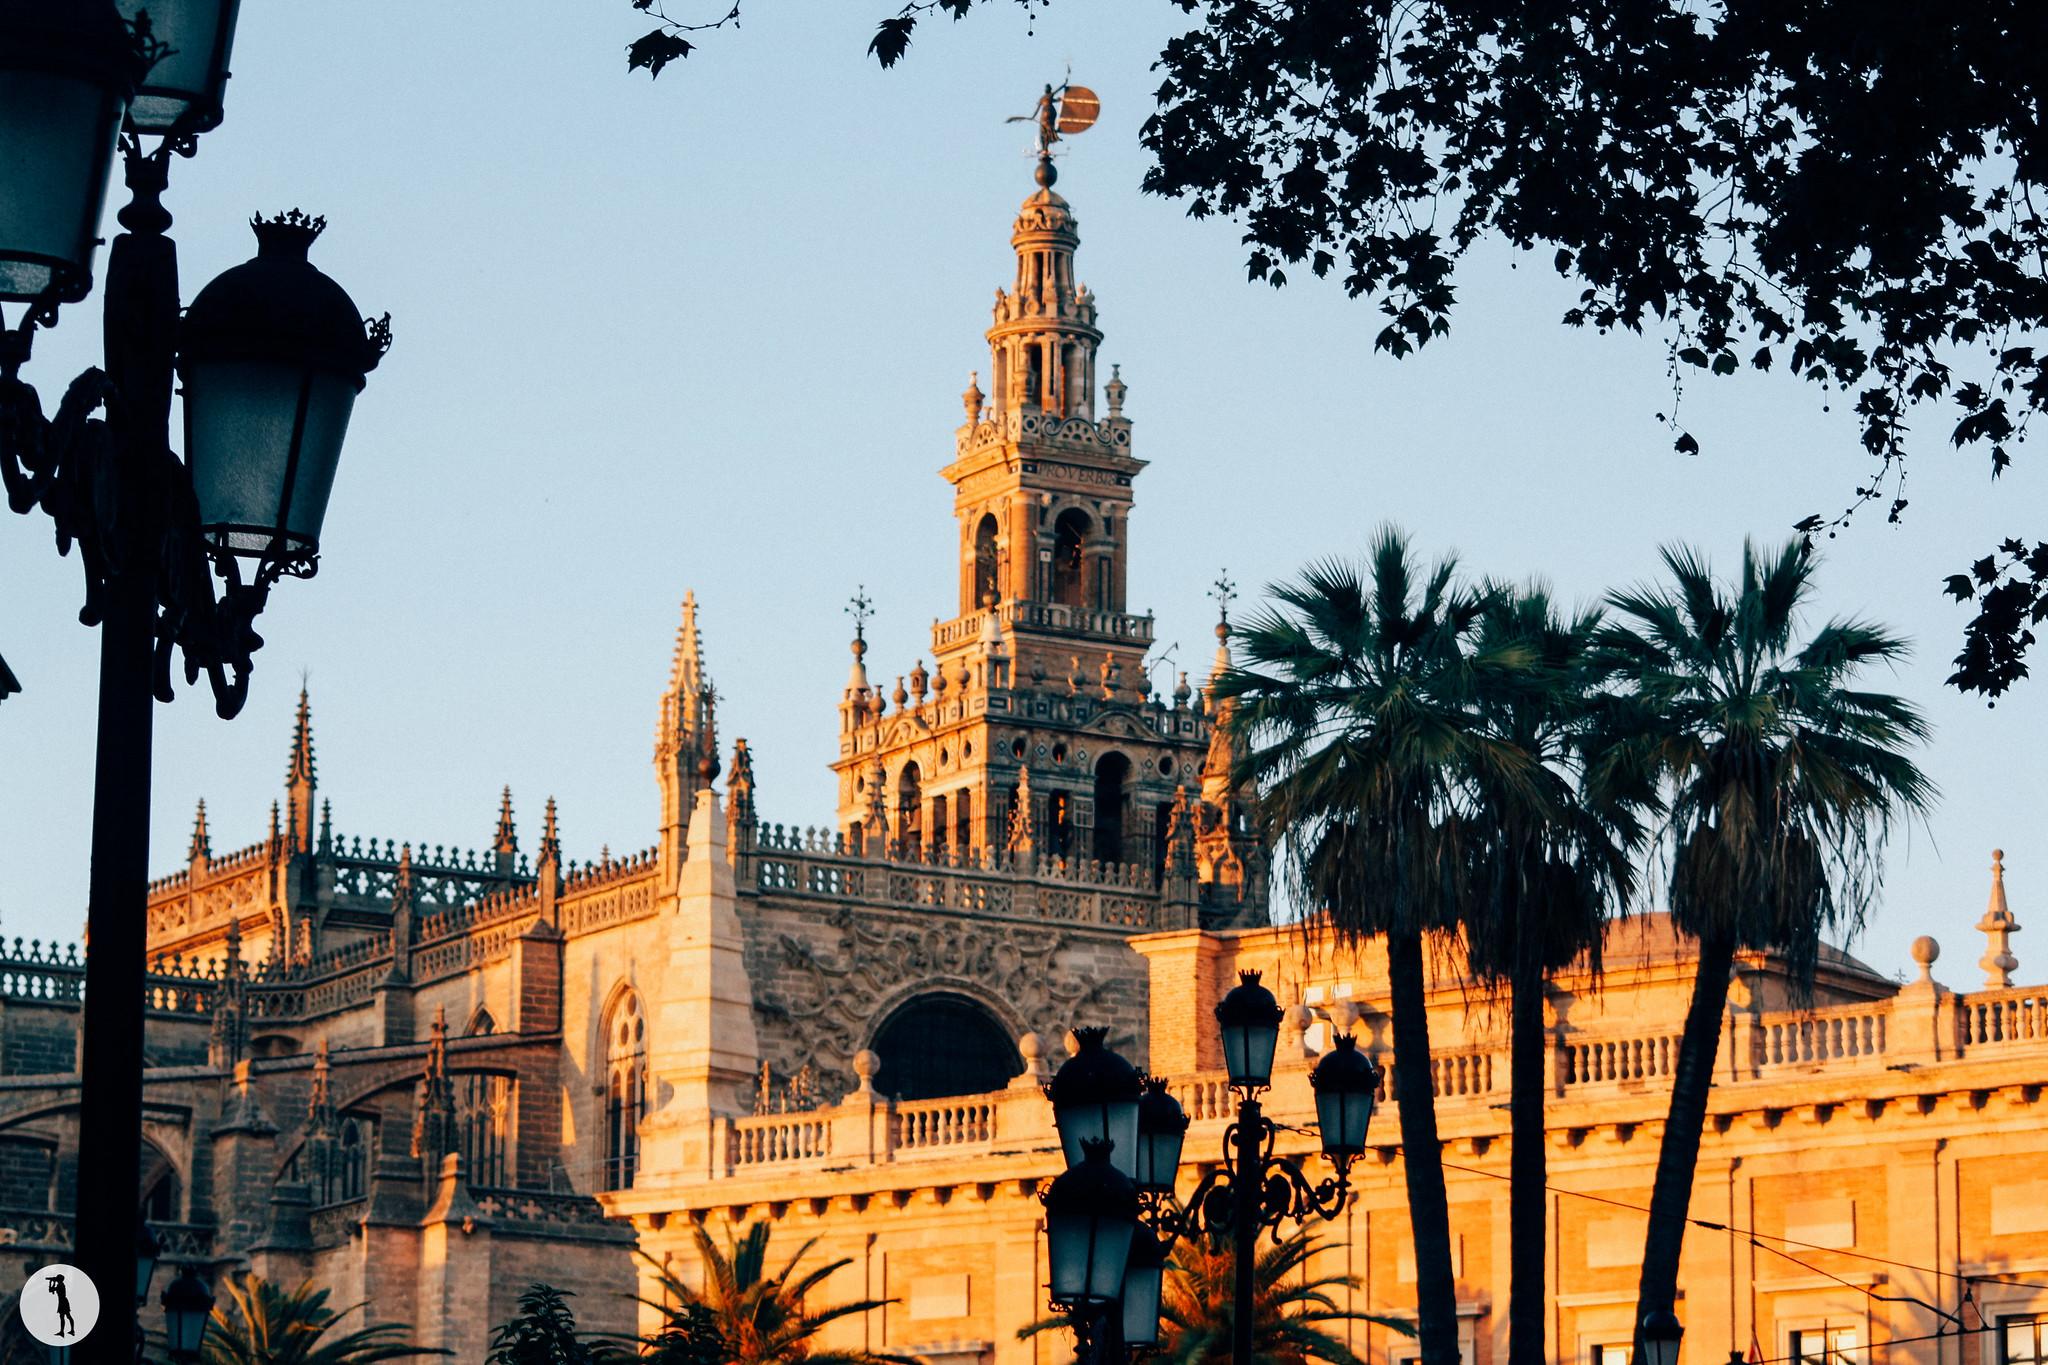 Voyage: Sevilla, Semaine Sainte (2012)